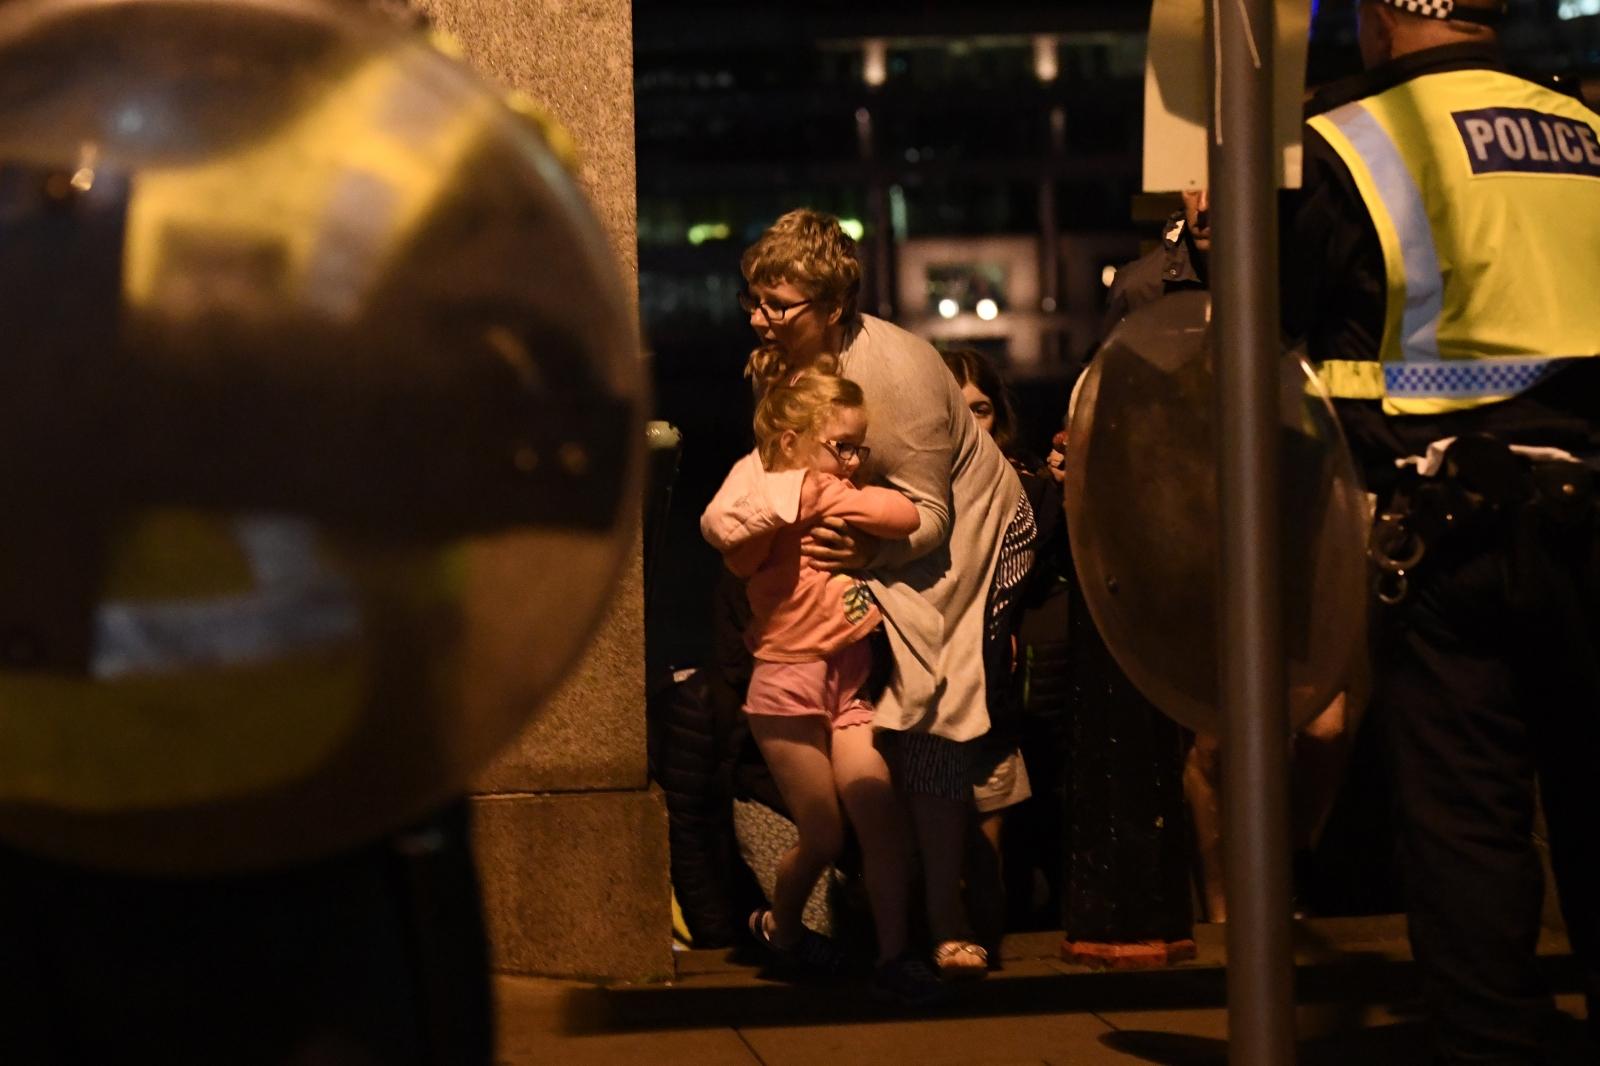 London Bridge and Borough Market terror attacks: Images of ...